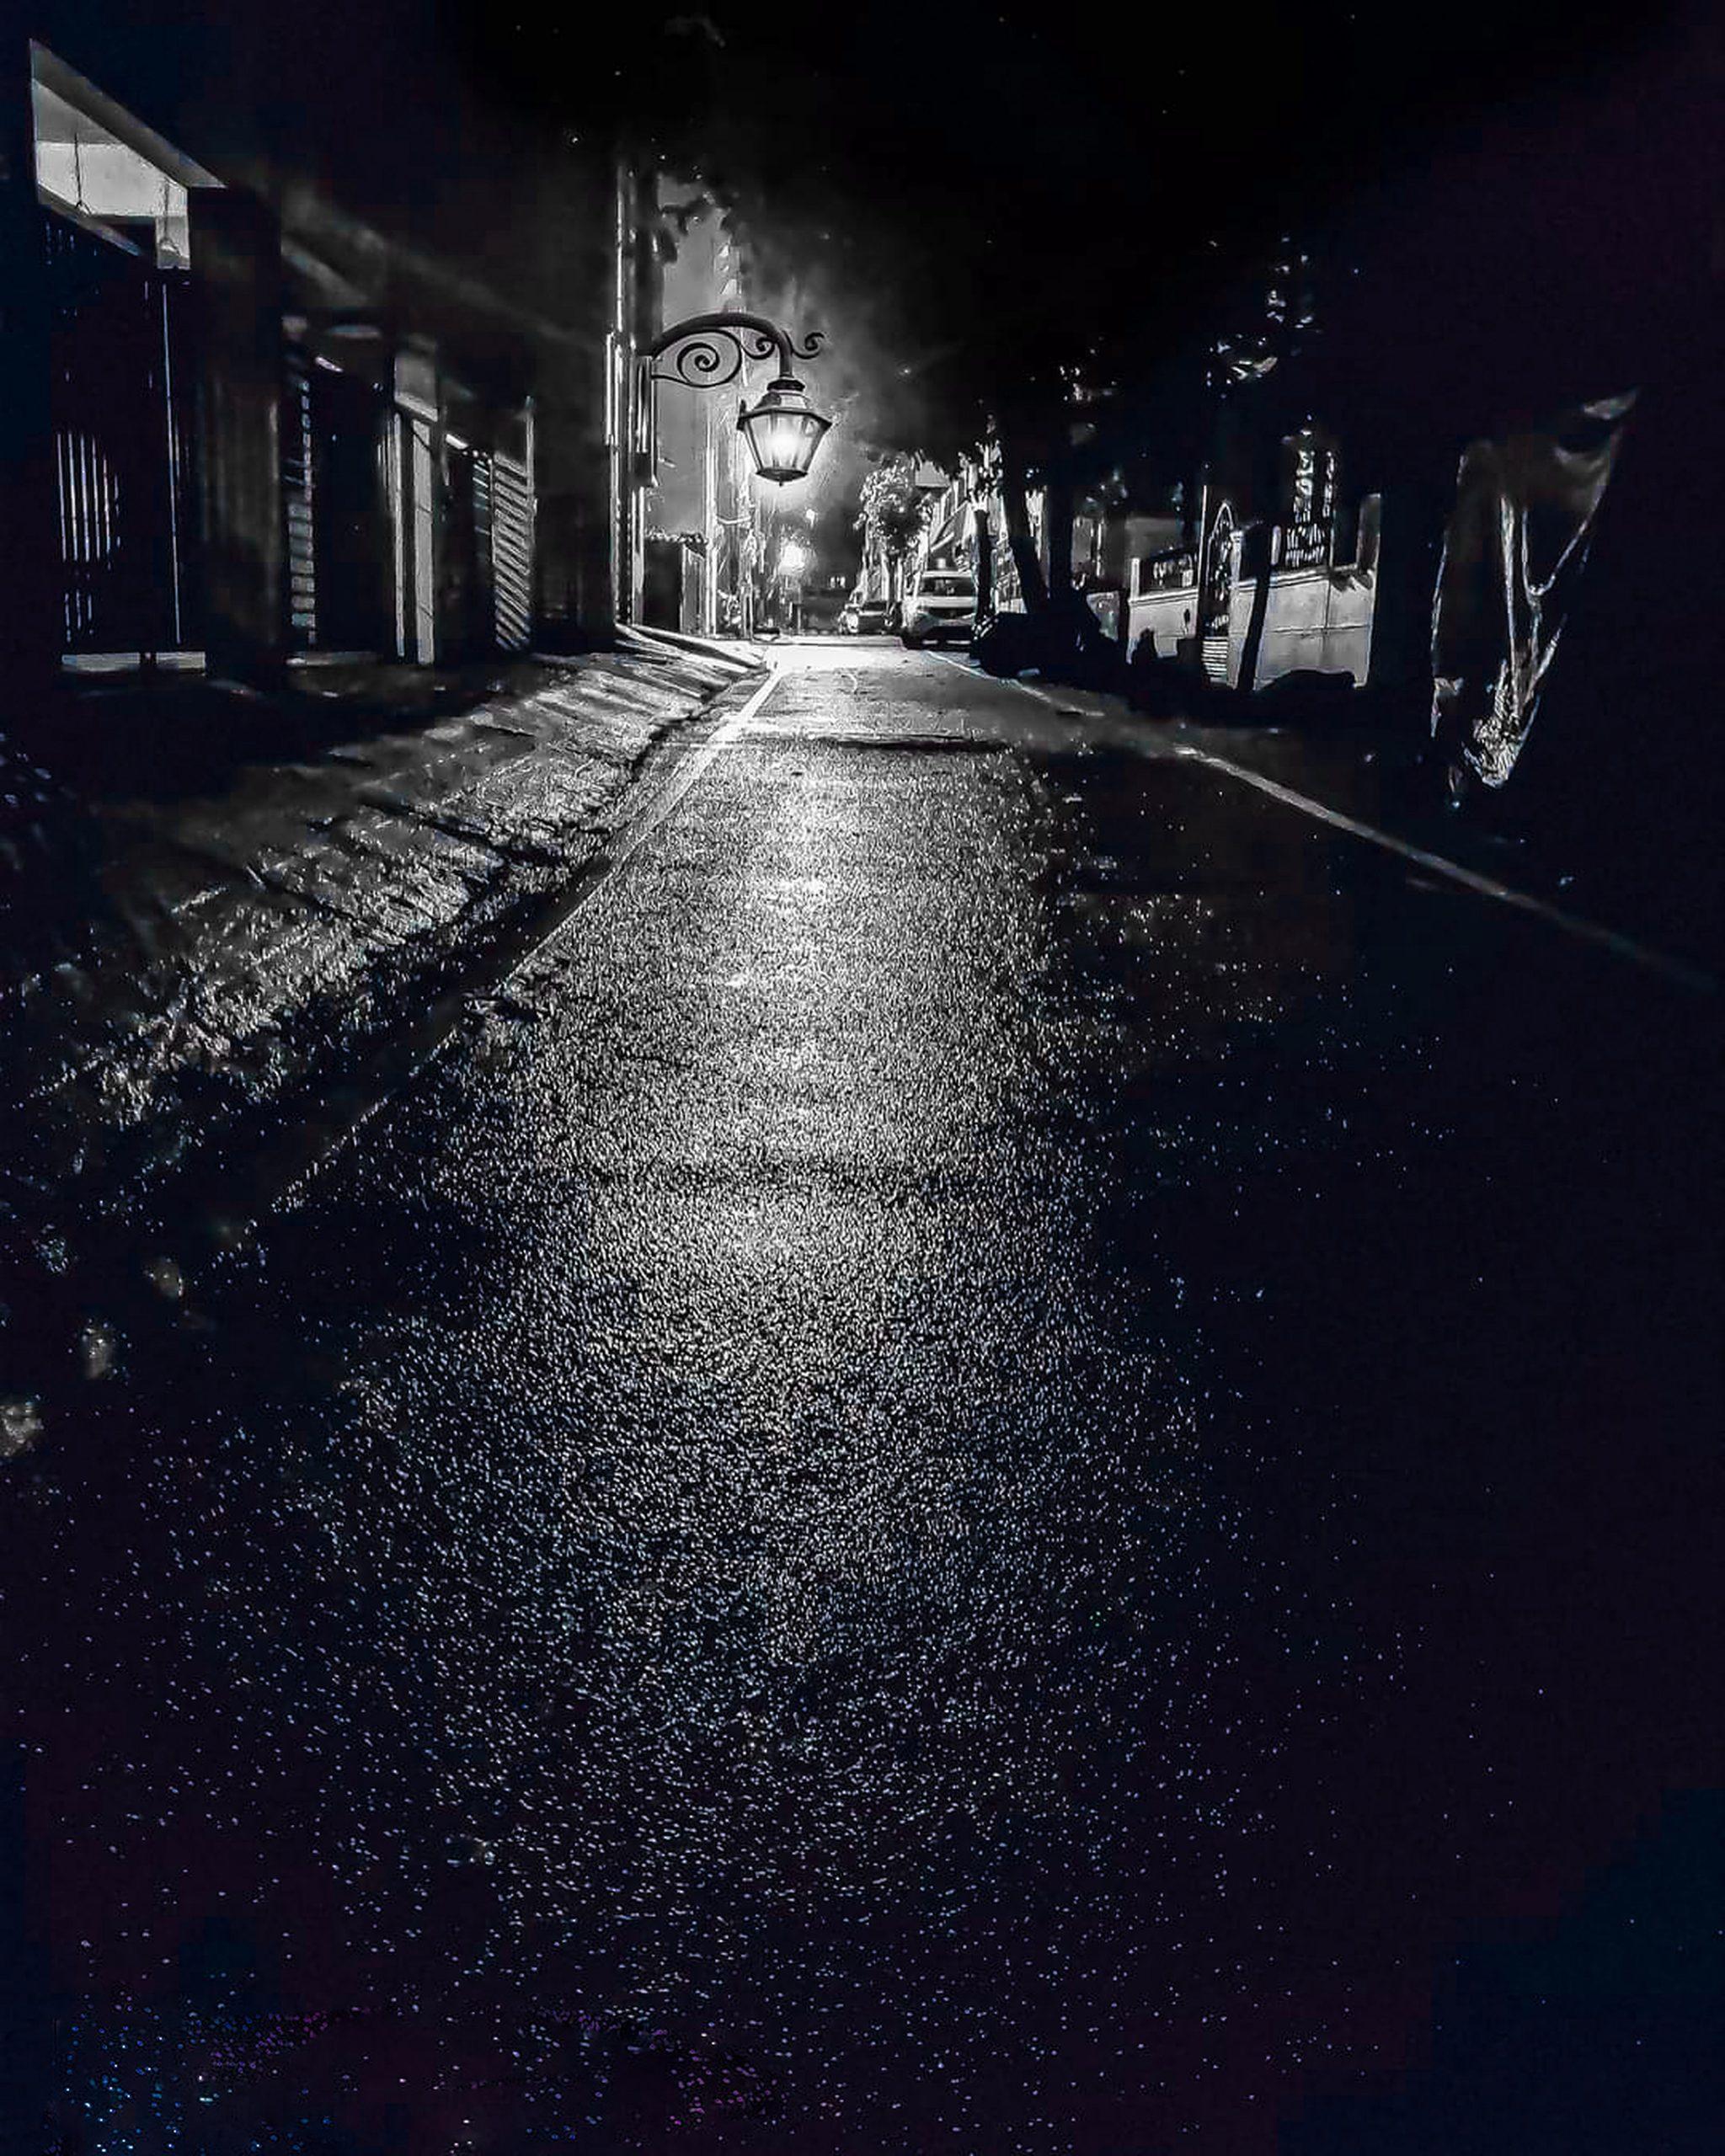 night street view